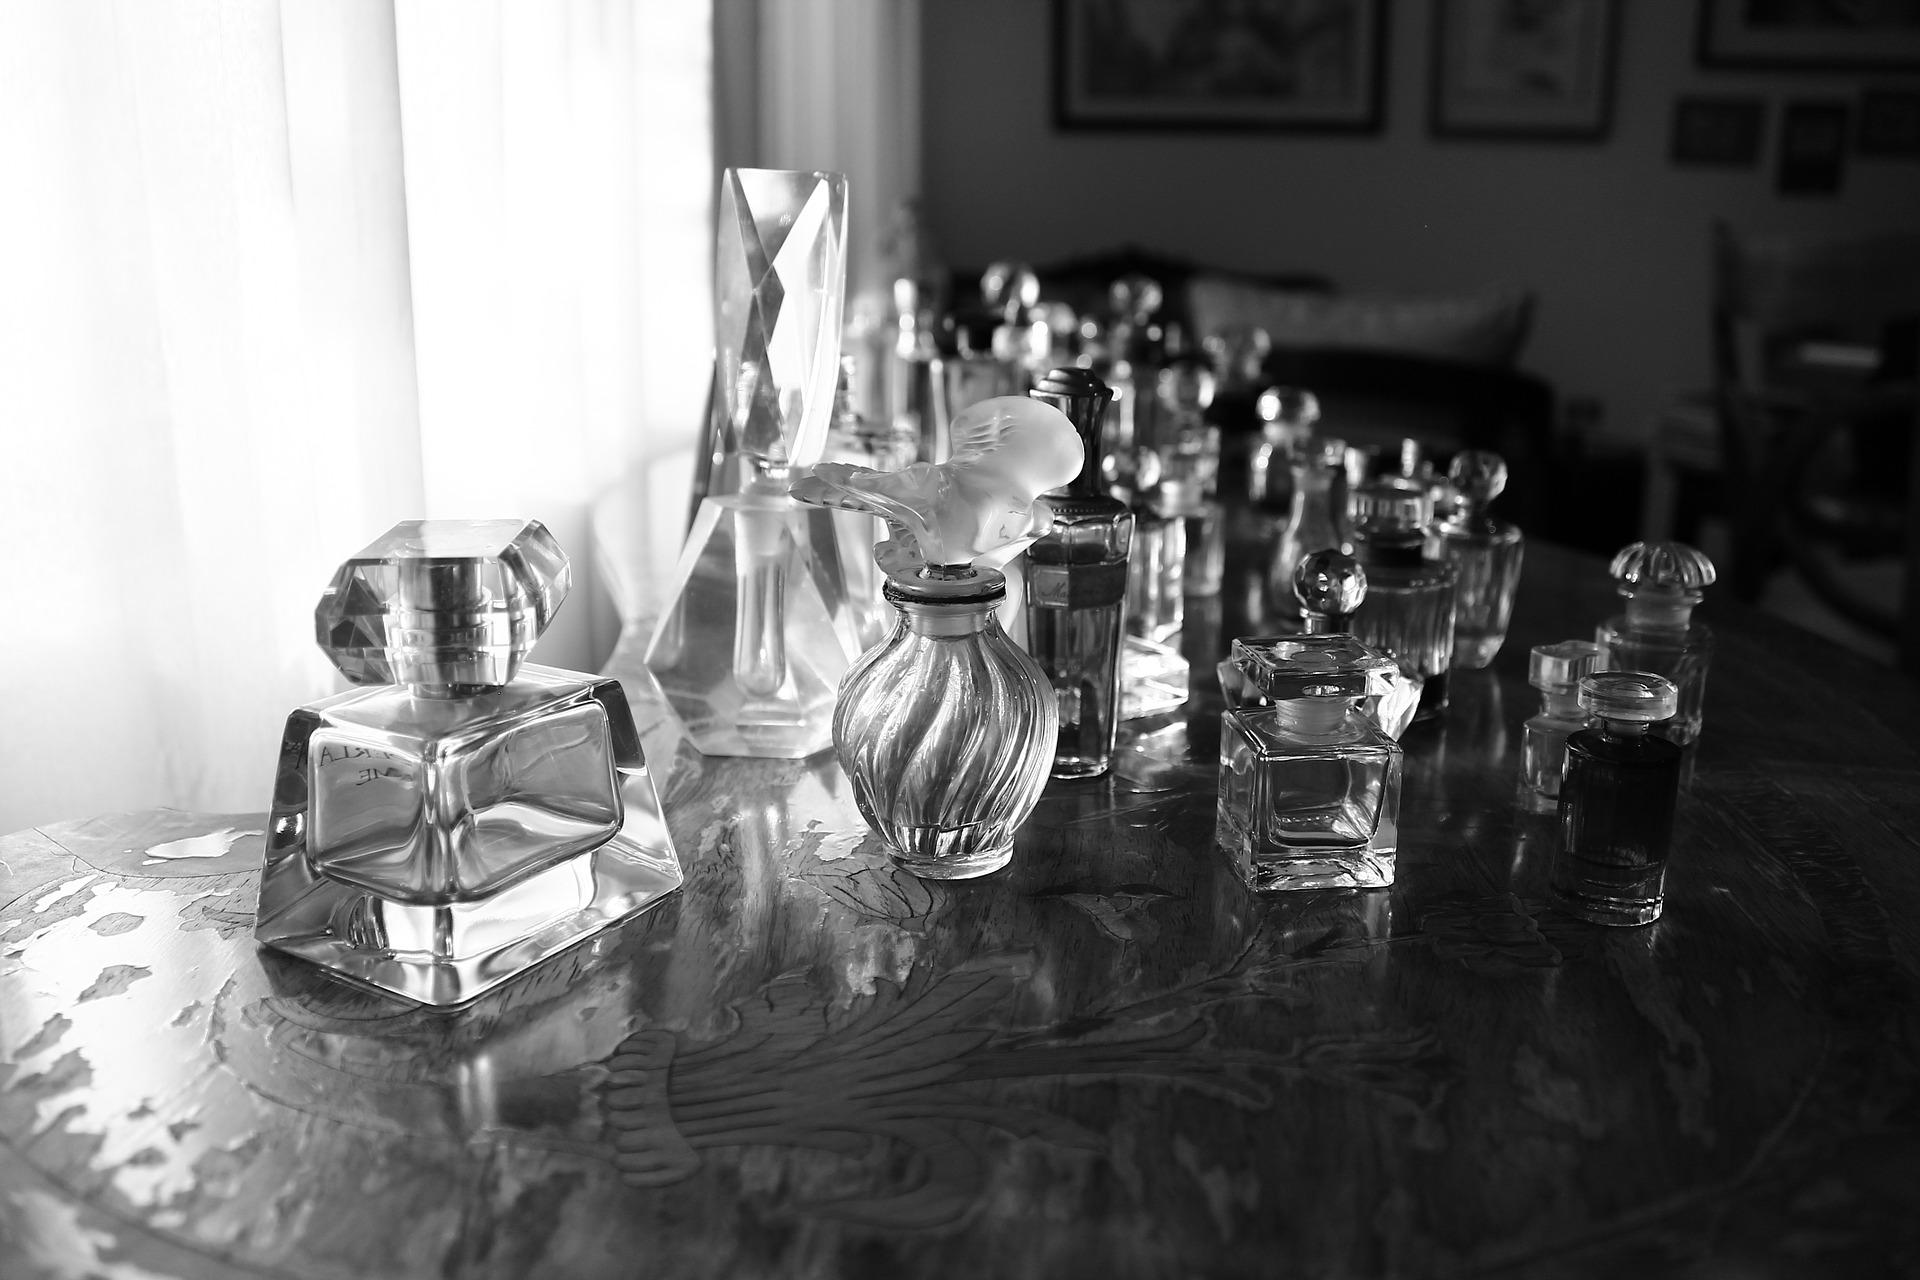 perfume bottles | © pixabay